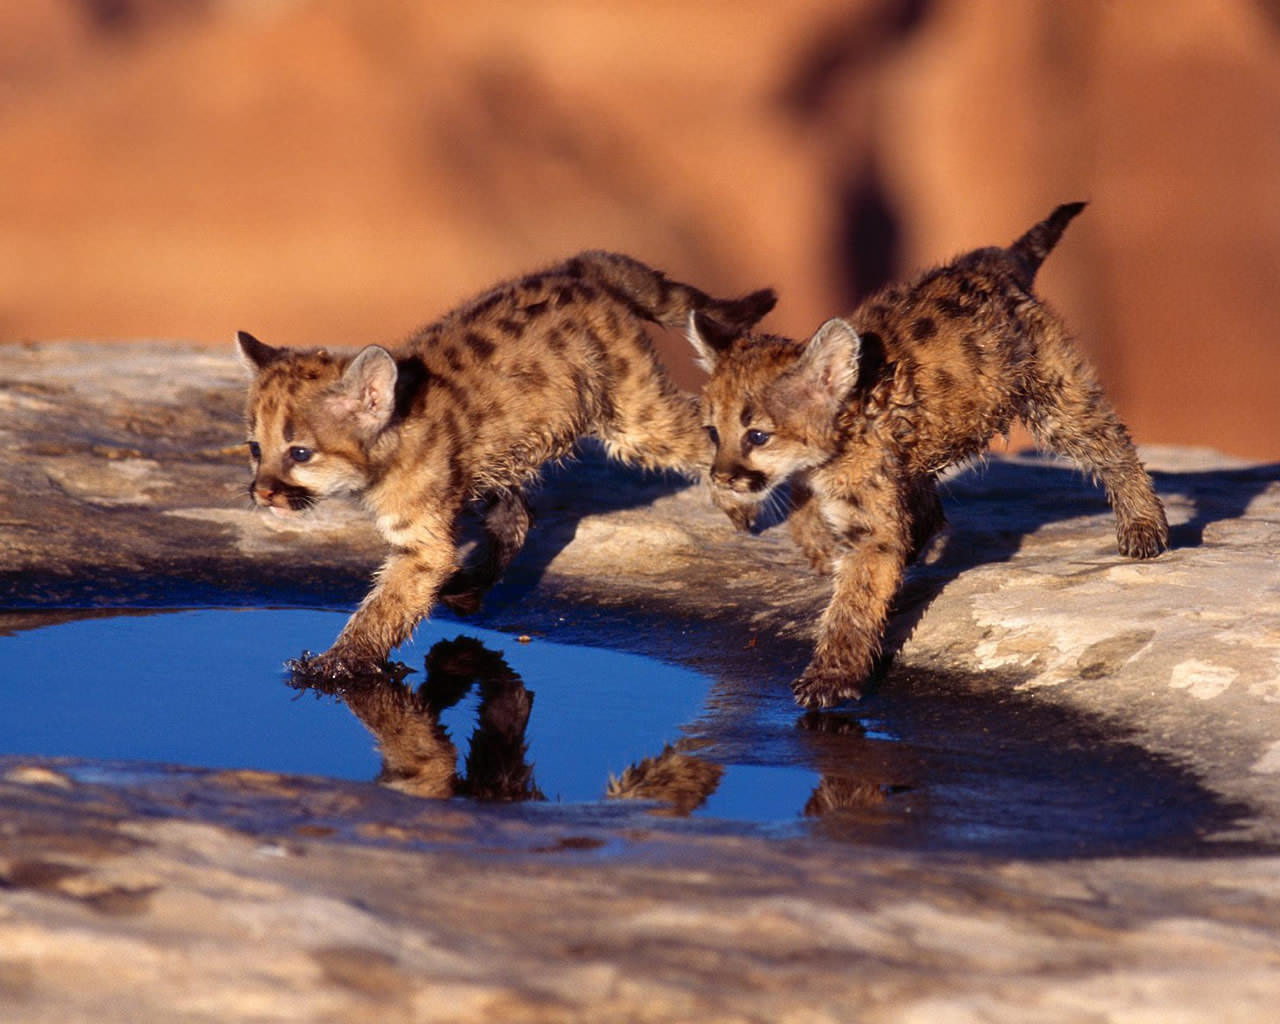 Baby Cougar Cubs Wallpaper 1280x1024 1280x1024